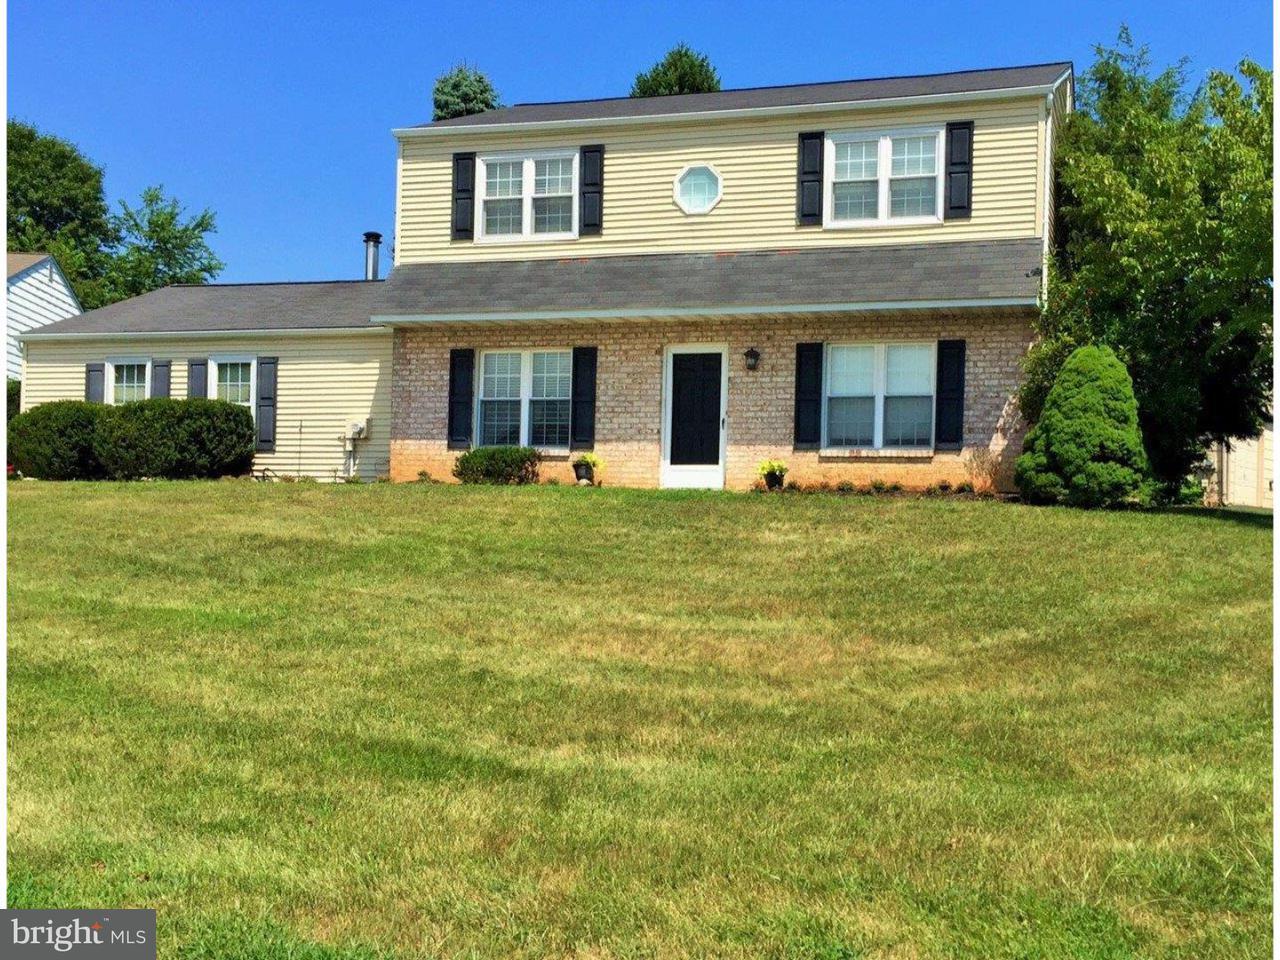 Single Family Home for Rent at 2 DEVON Circle Paoli, Pennsylvania 19301 United States